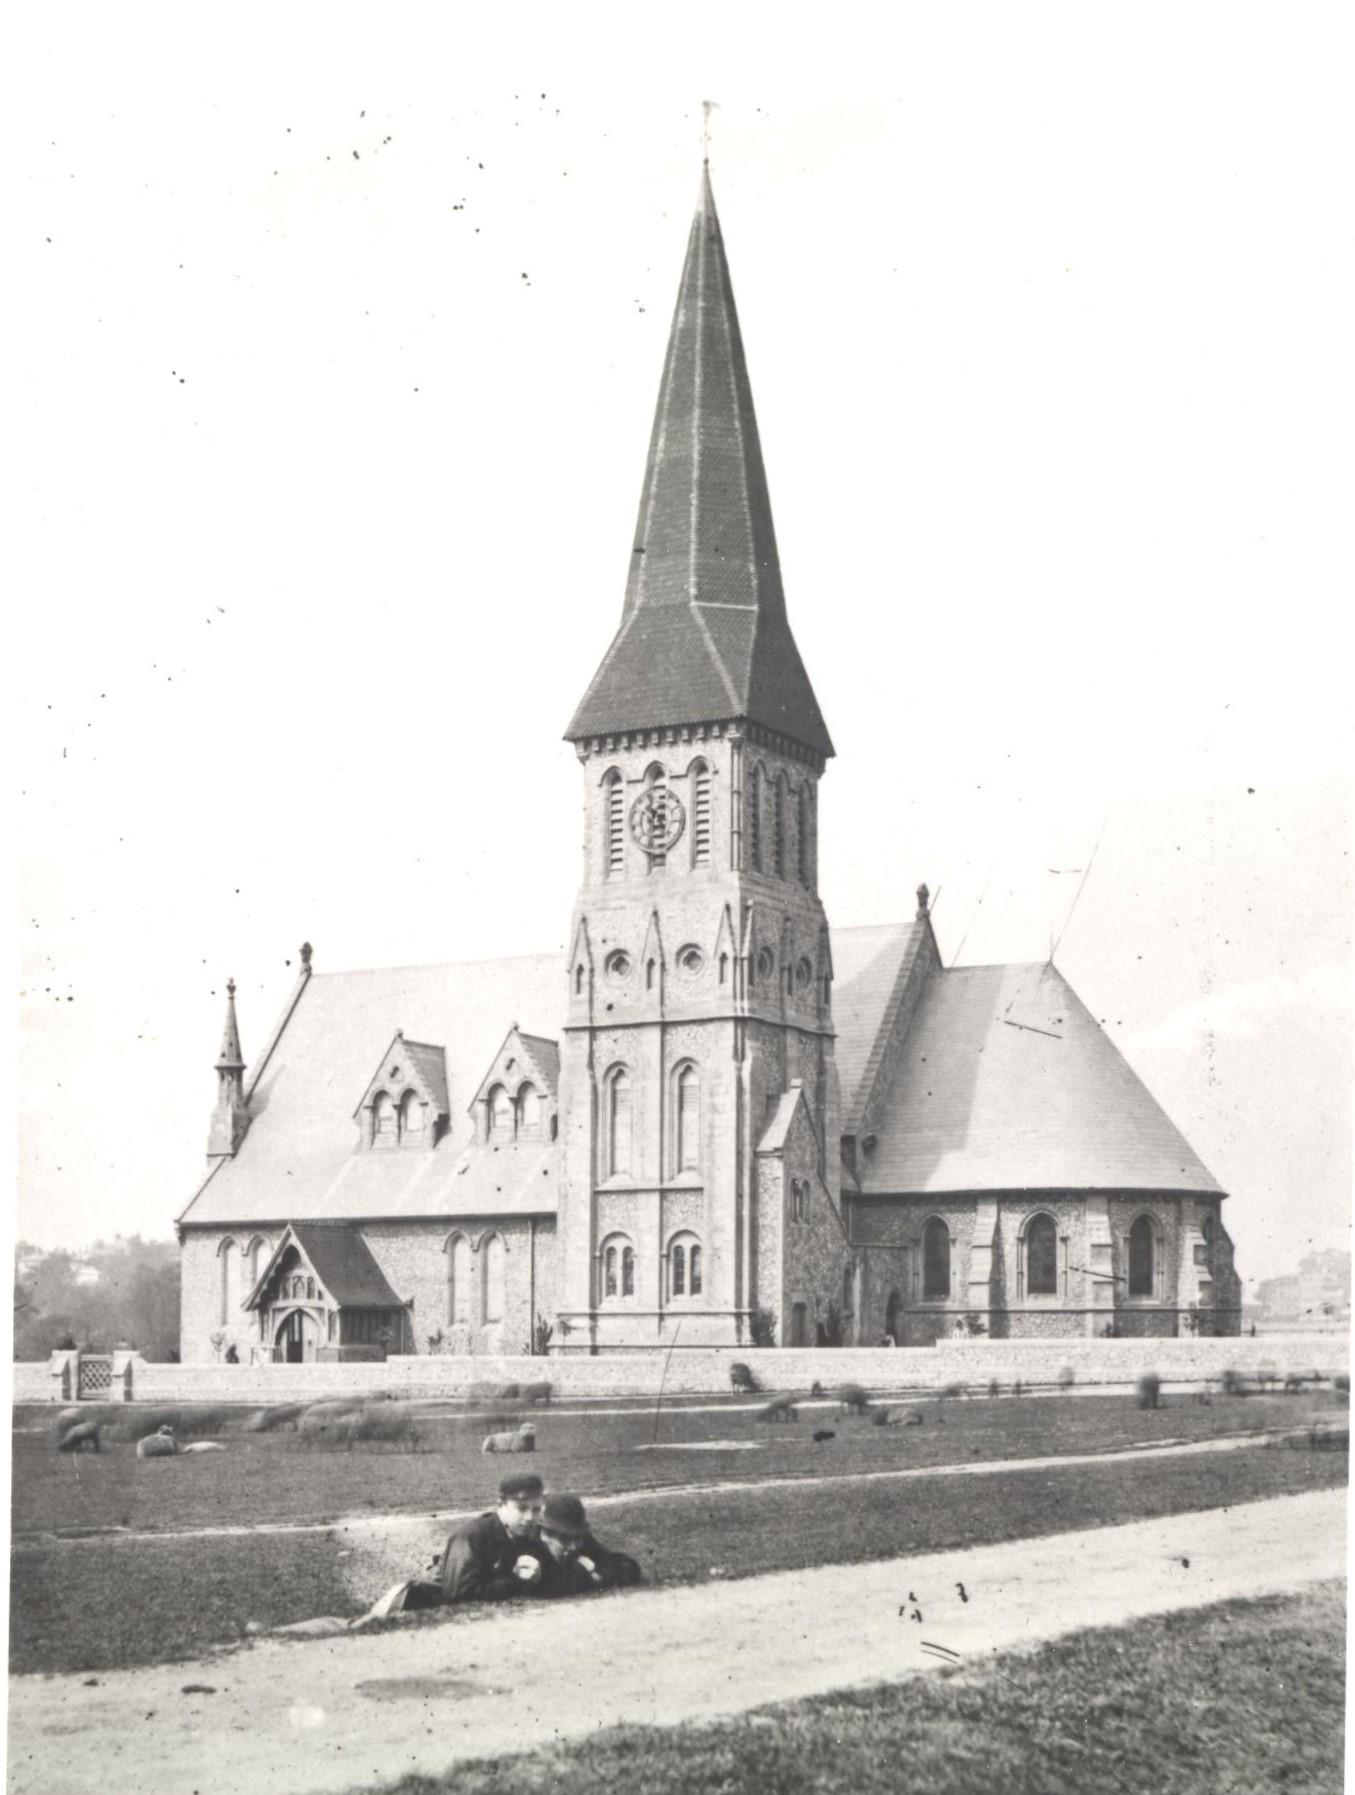 Black & White image of St Johns in 1866